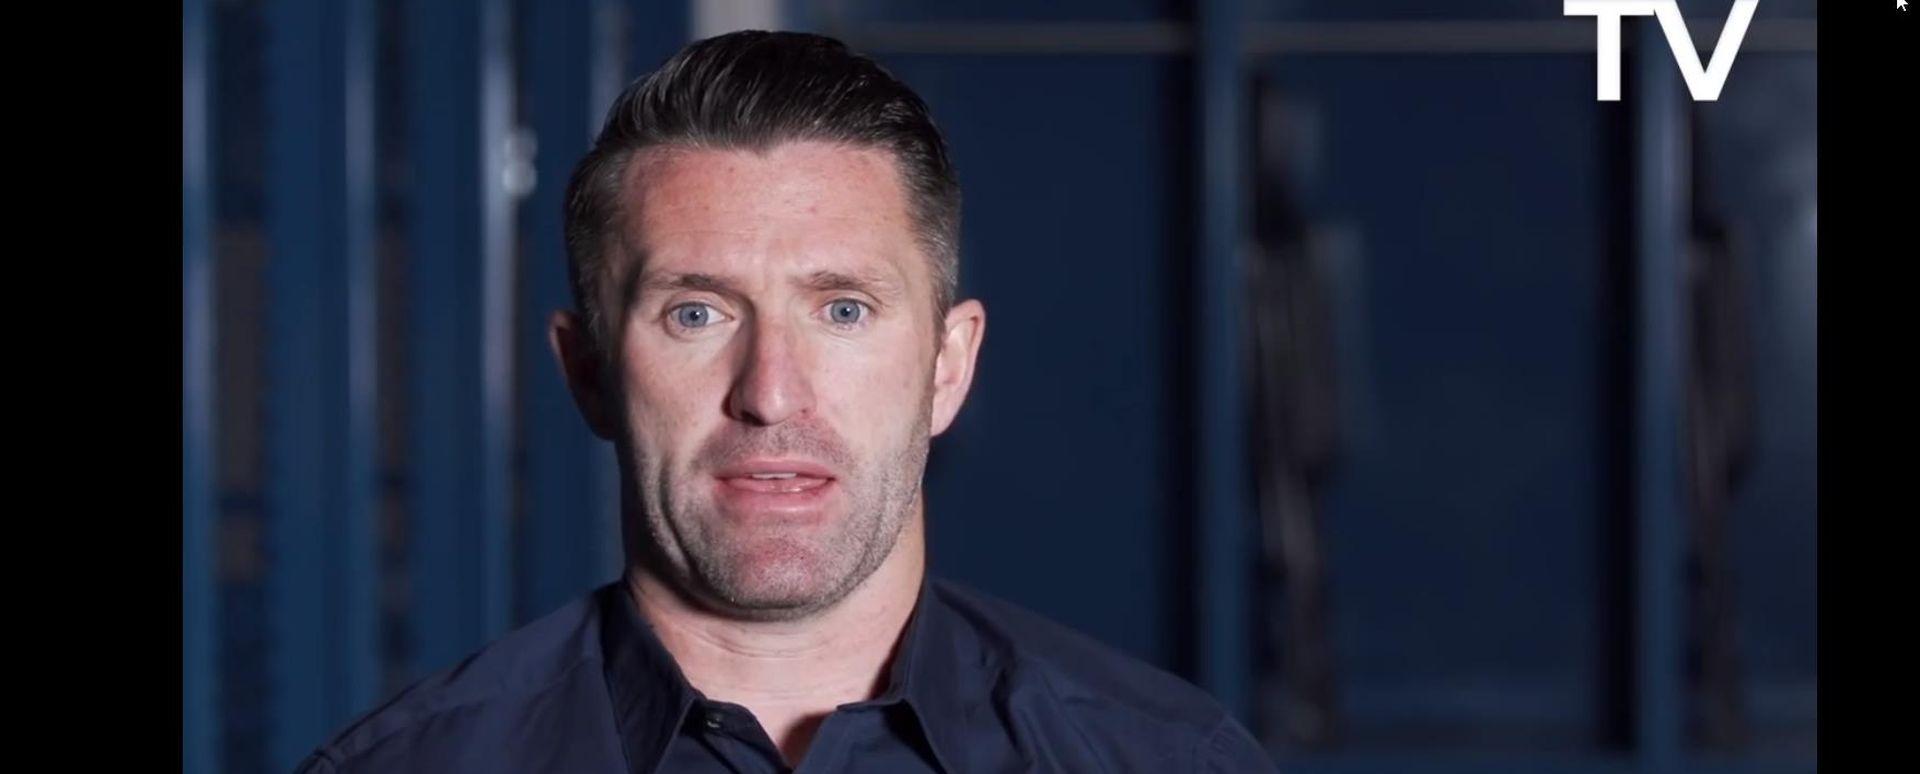 Robbie Keane završio karijeru